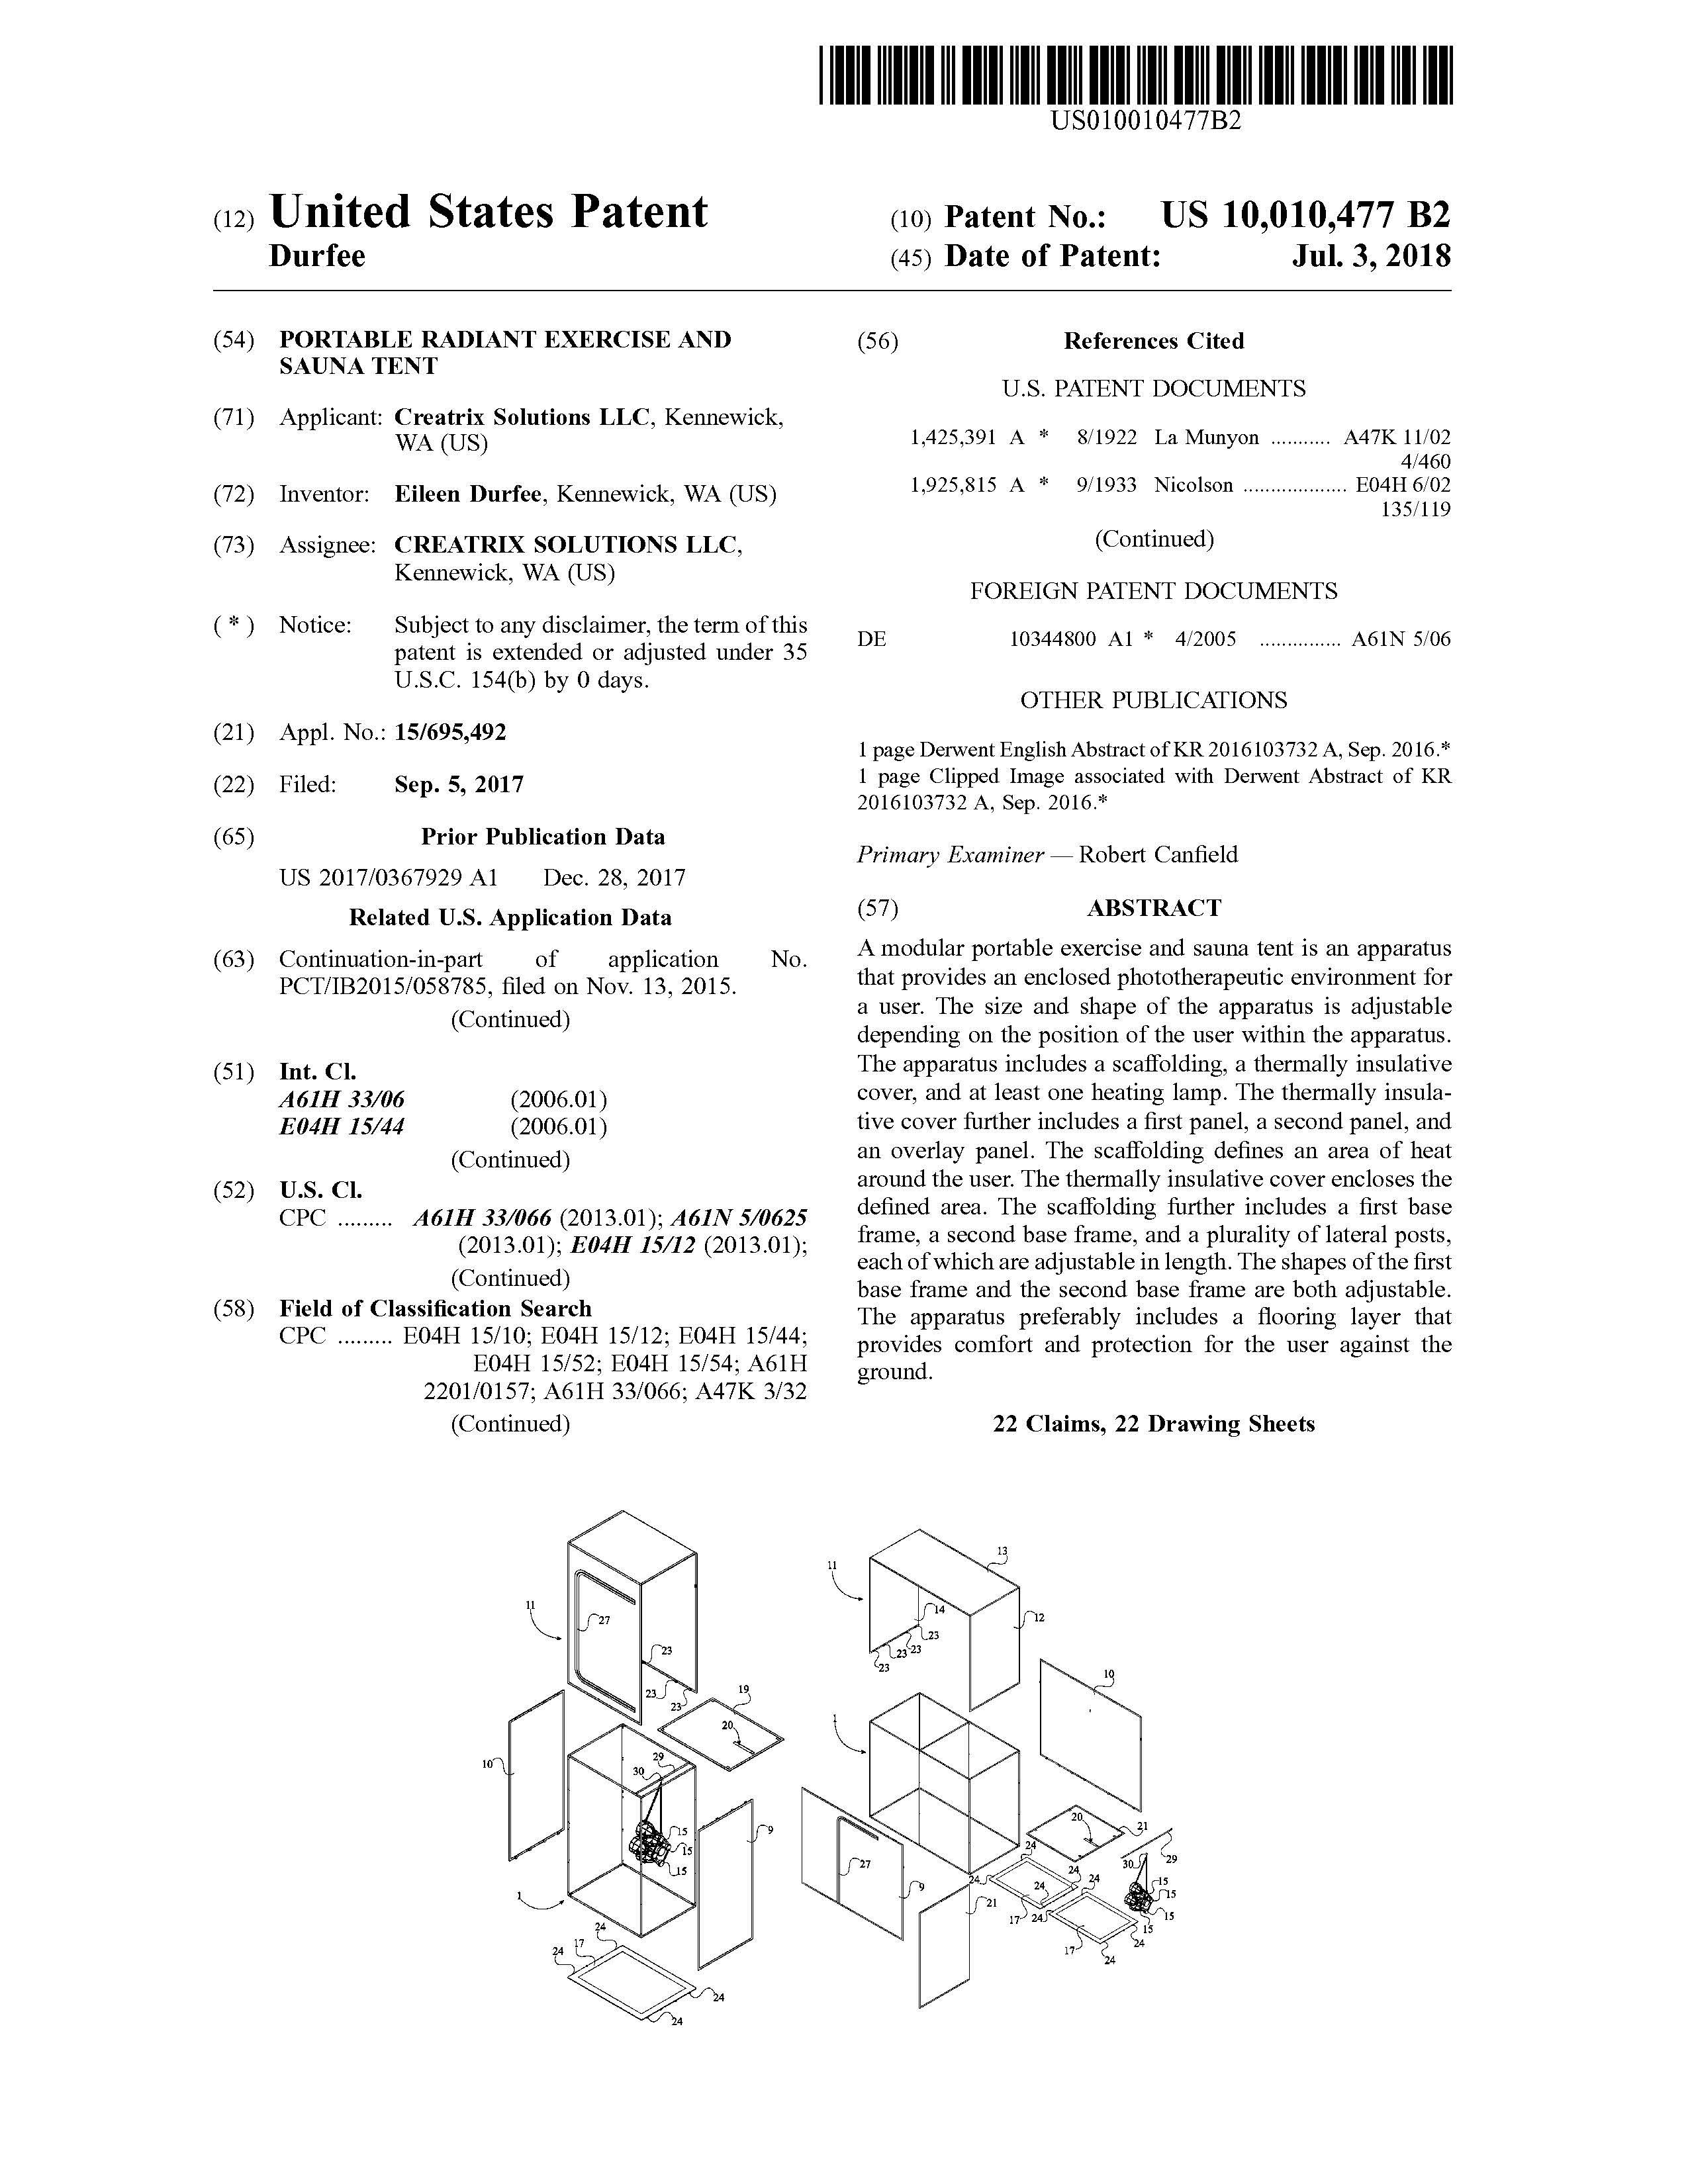 Sauna Tent Patent Page 1